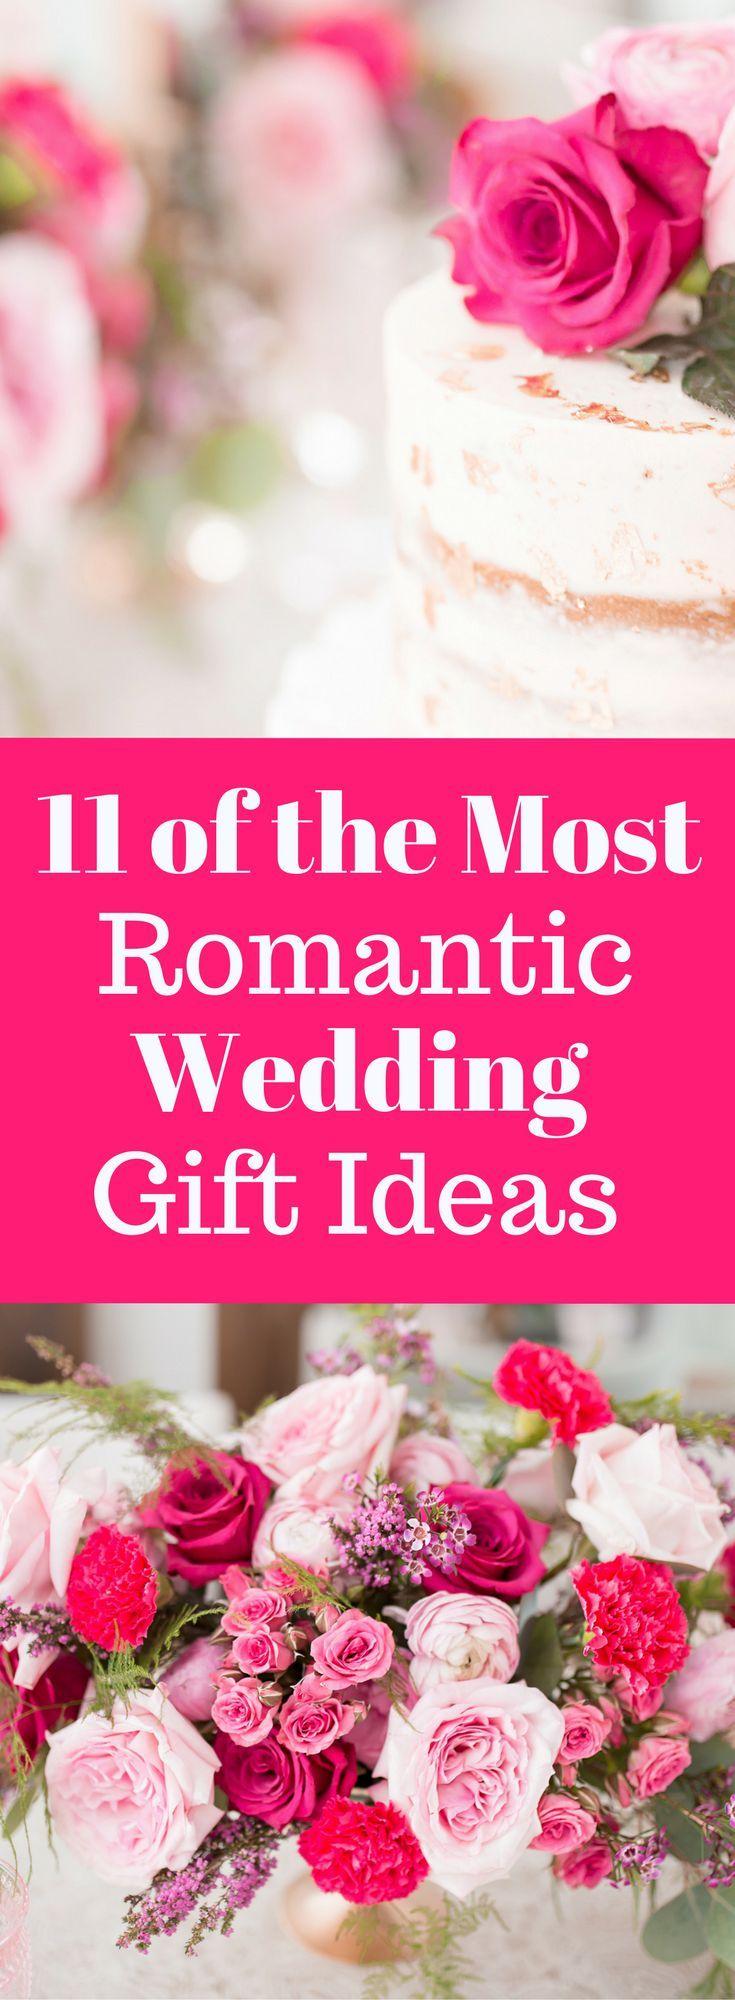 73 best Wedding WOW images on Pinterest | Wedding stuff, Happy ...